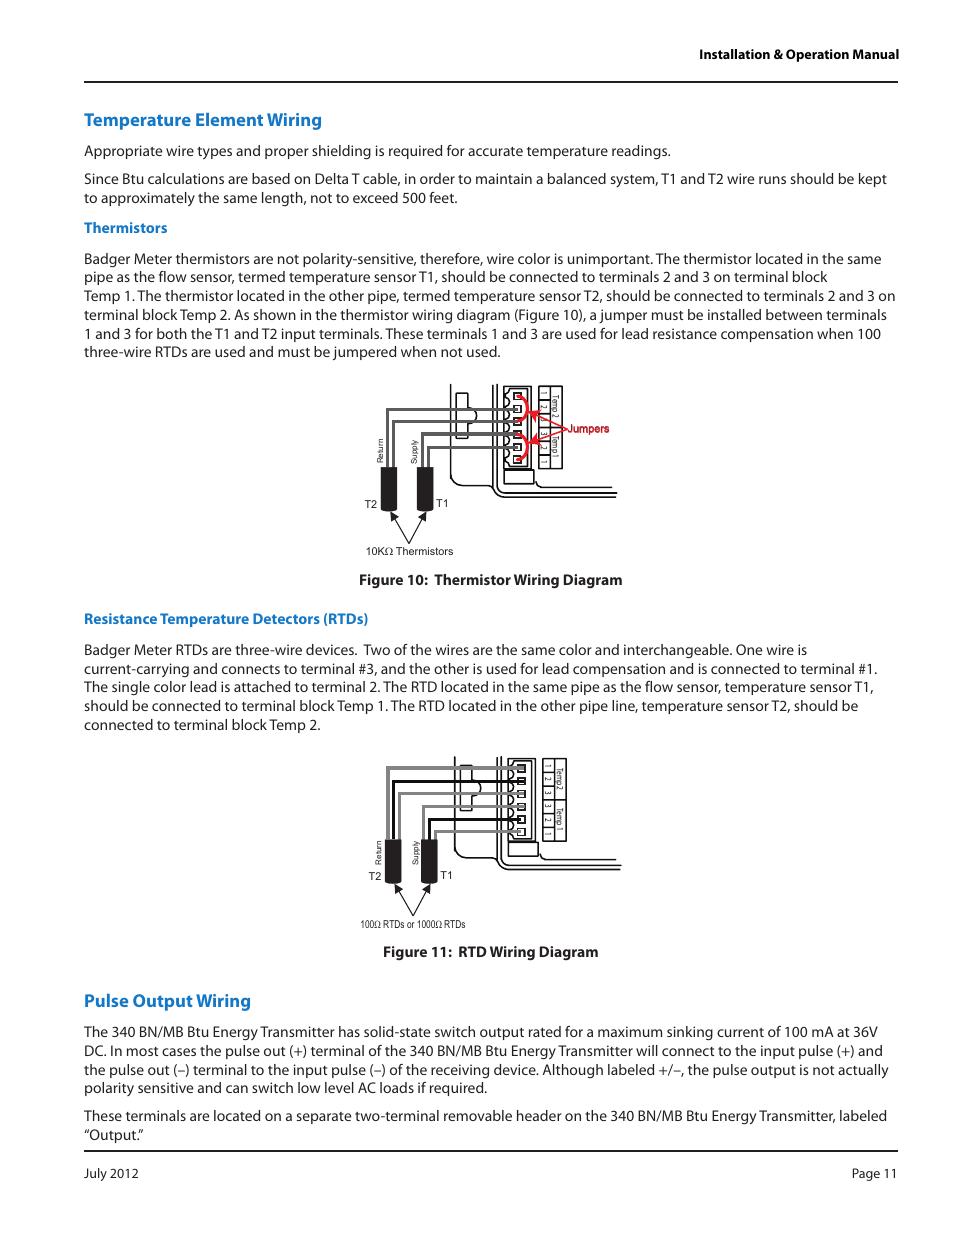 medium resolution of temperature element wiring thermistors resistance temperature detectors rtds badger meter 340